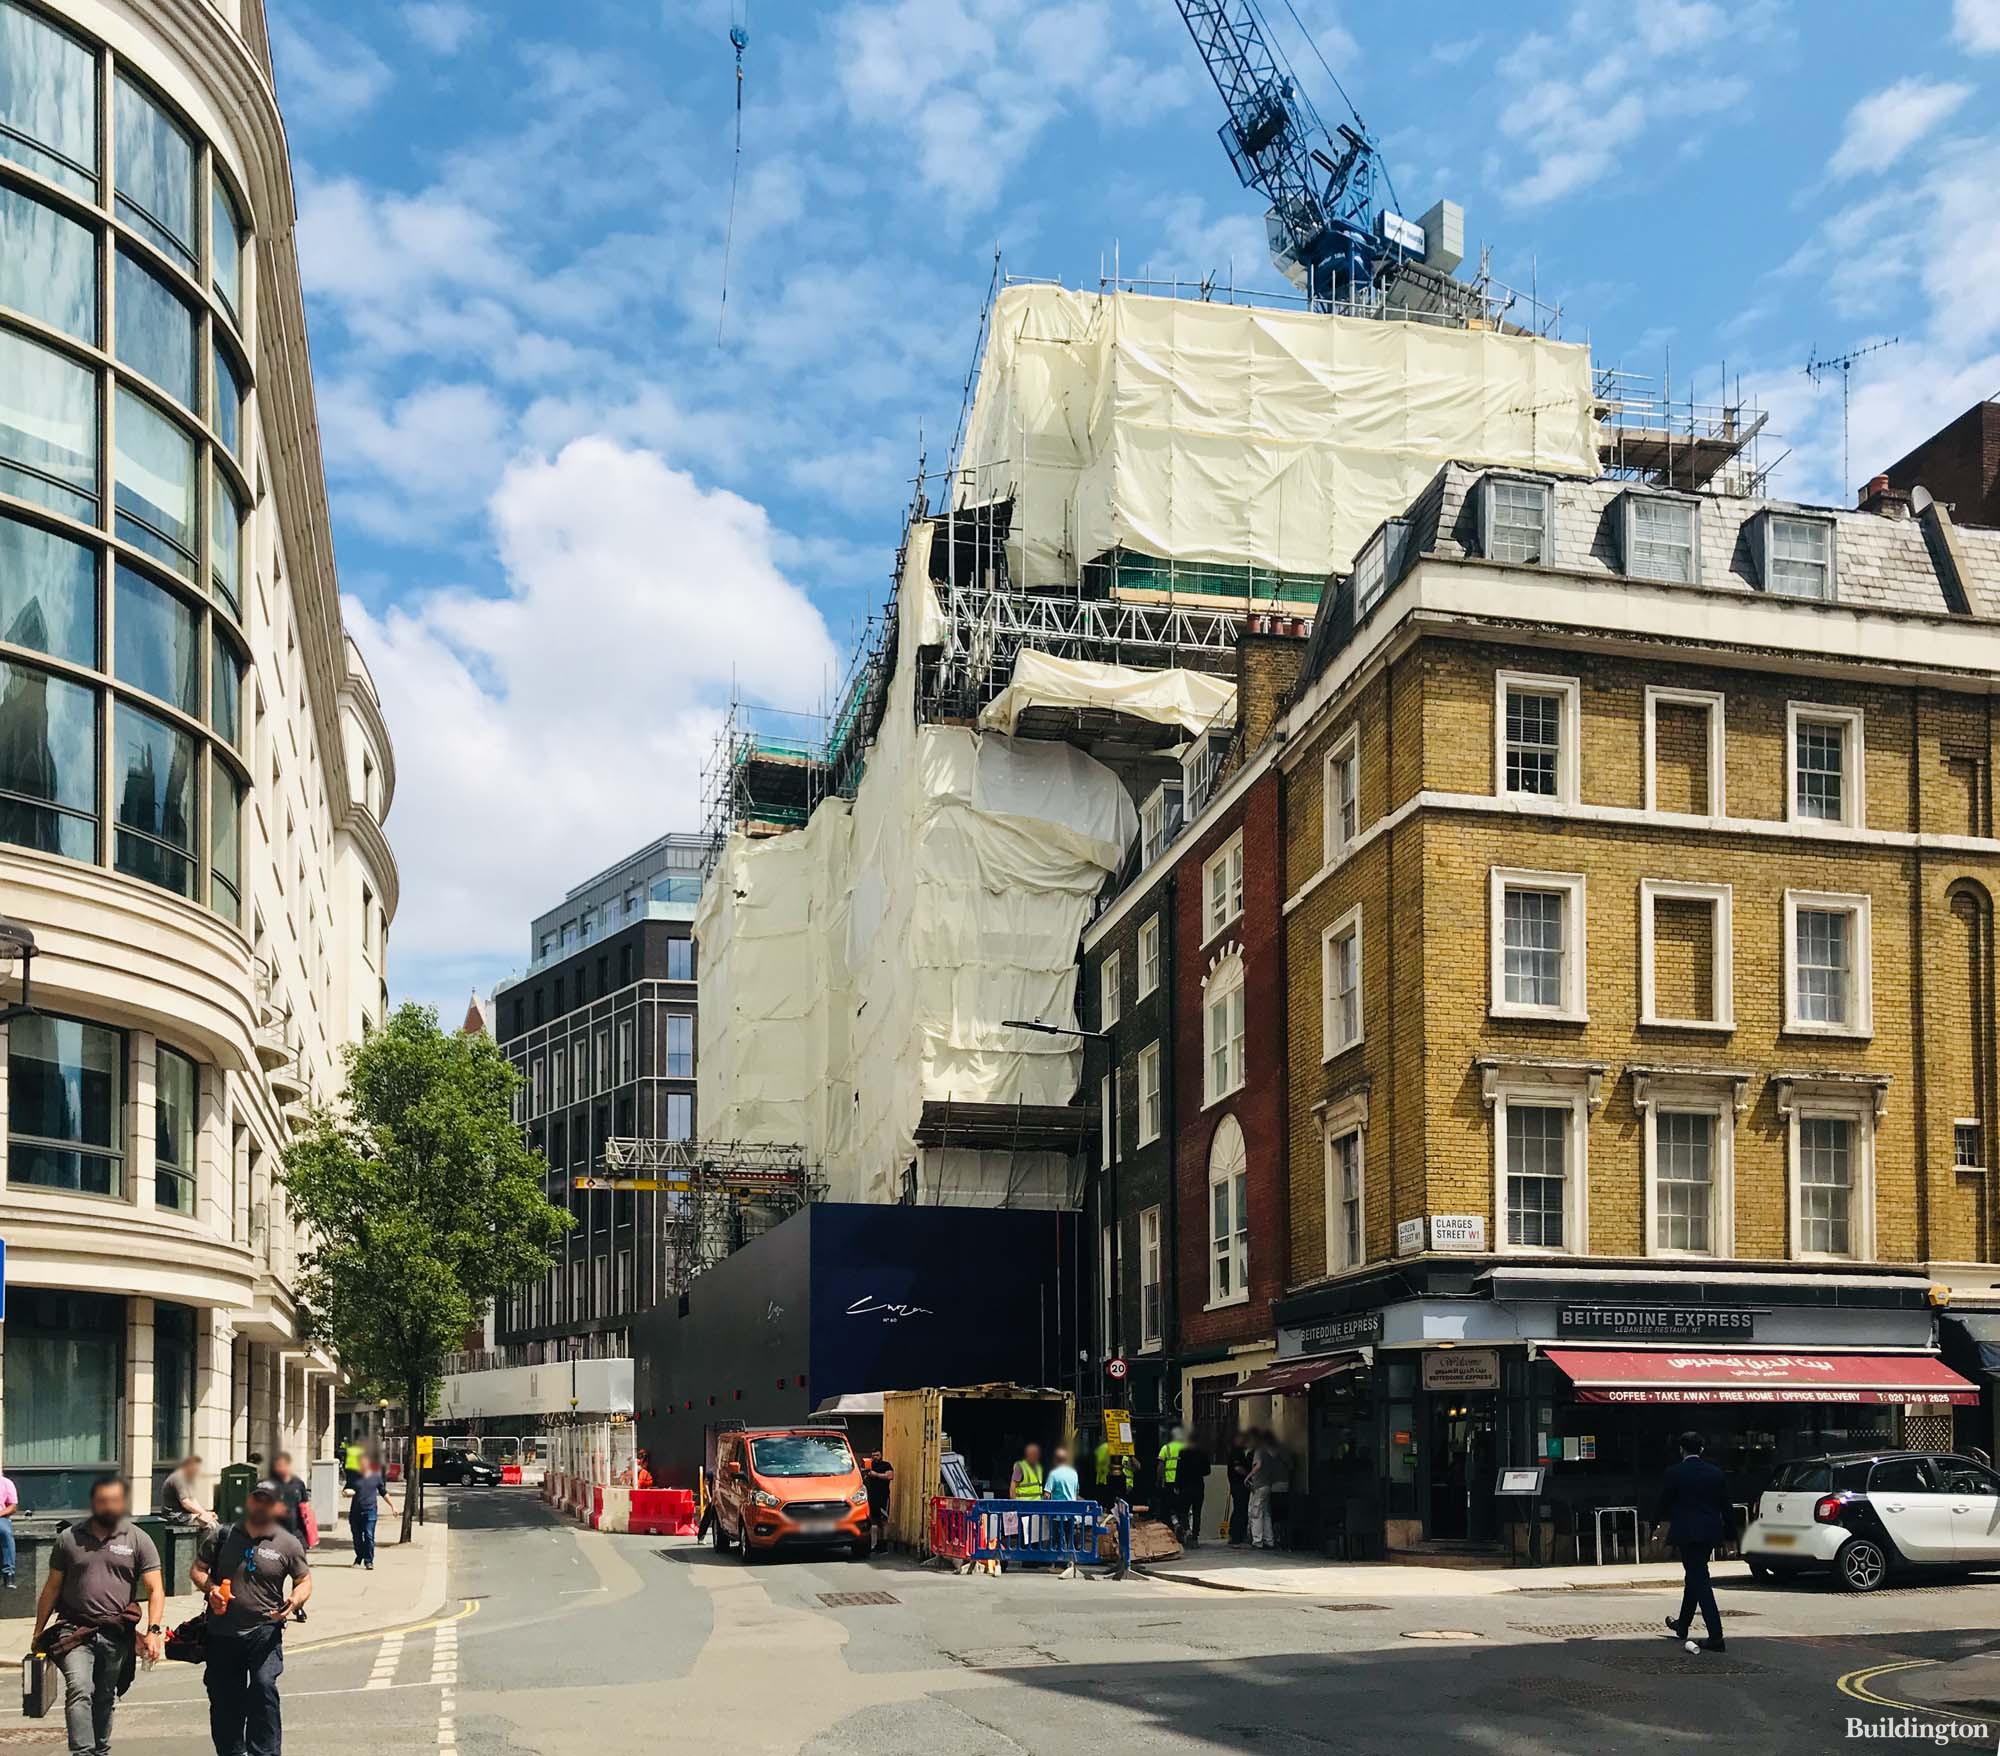 60 Curzon development under construction in Mayfair, London W1.